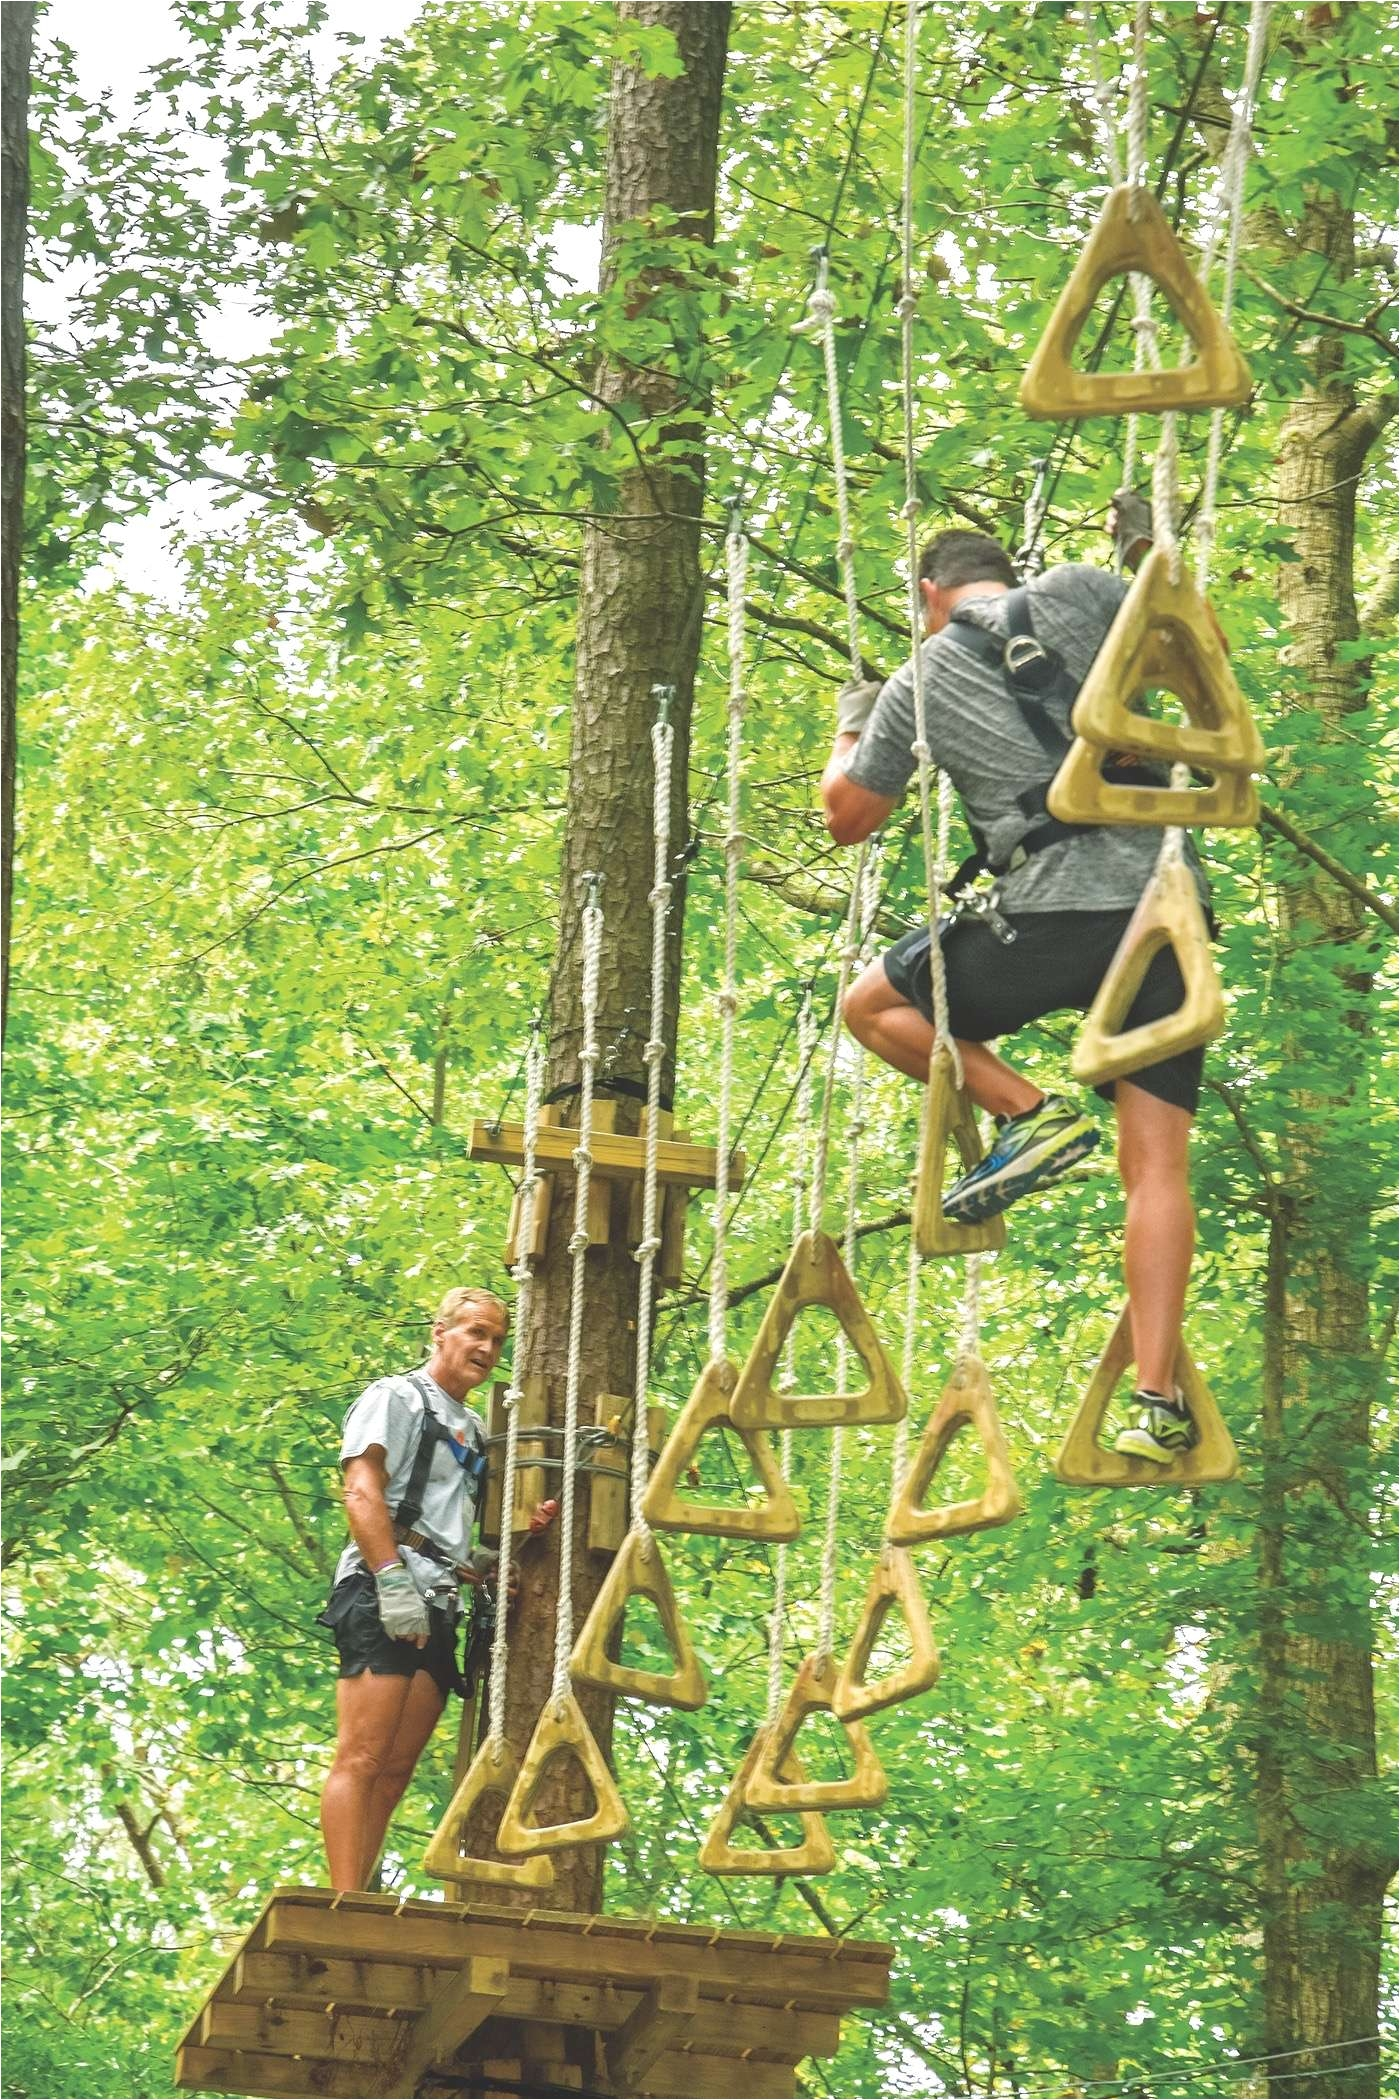 backyard zip line safety elegant zipline courses throughout virginia are high on thrills savor virginia